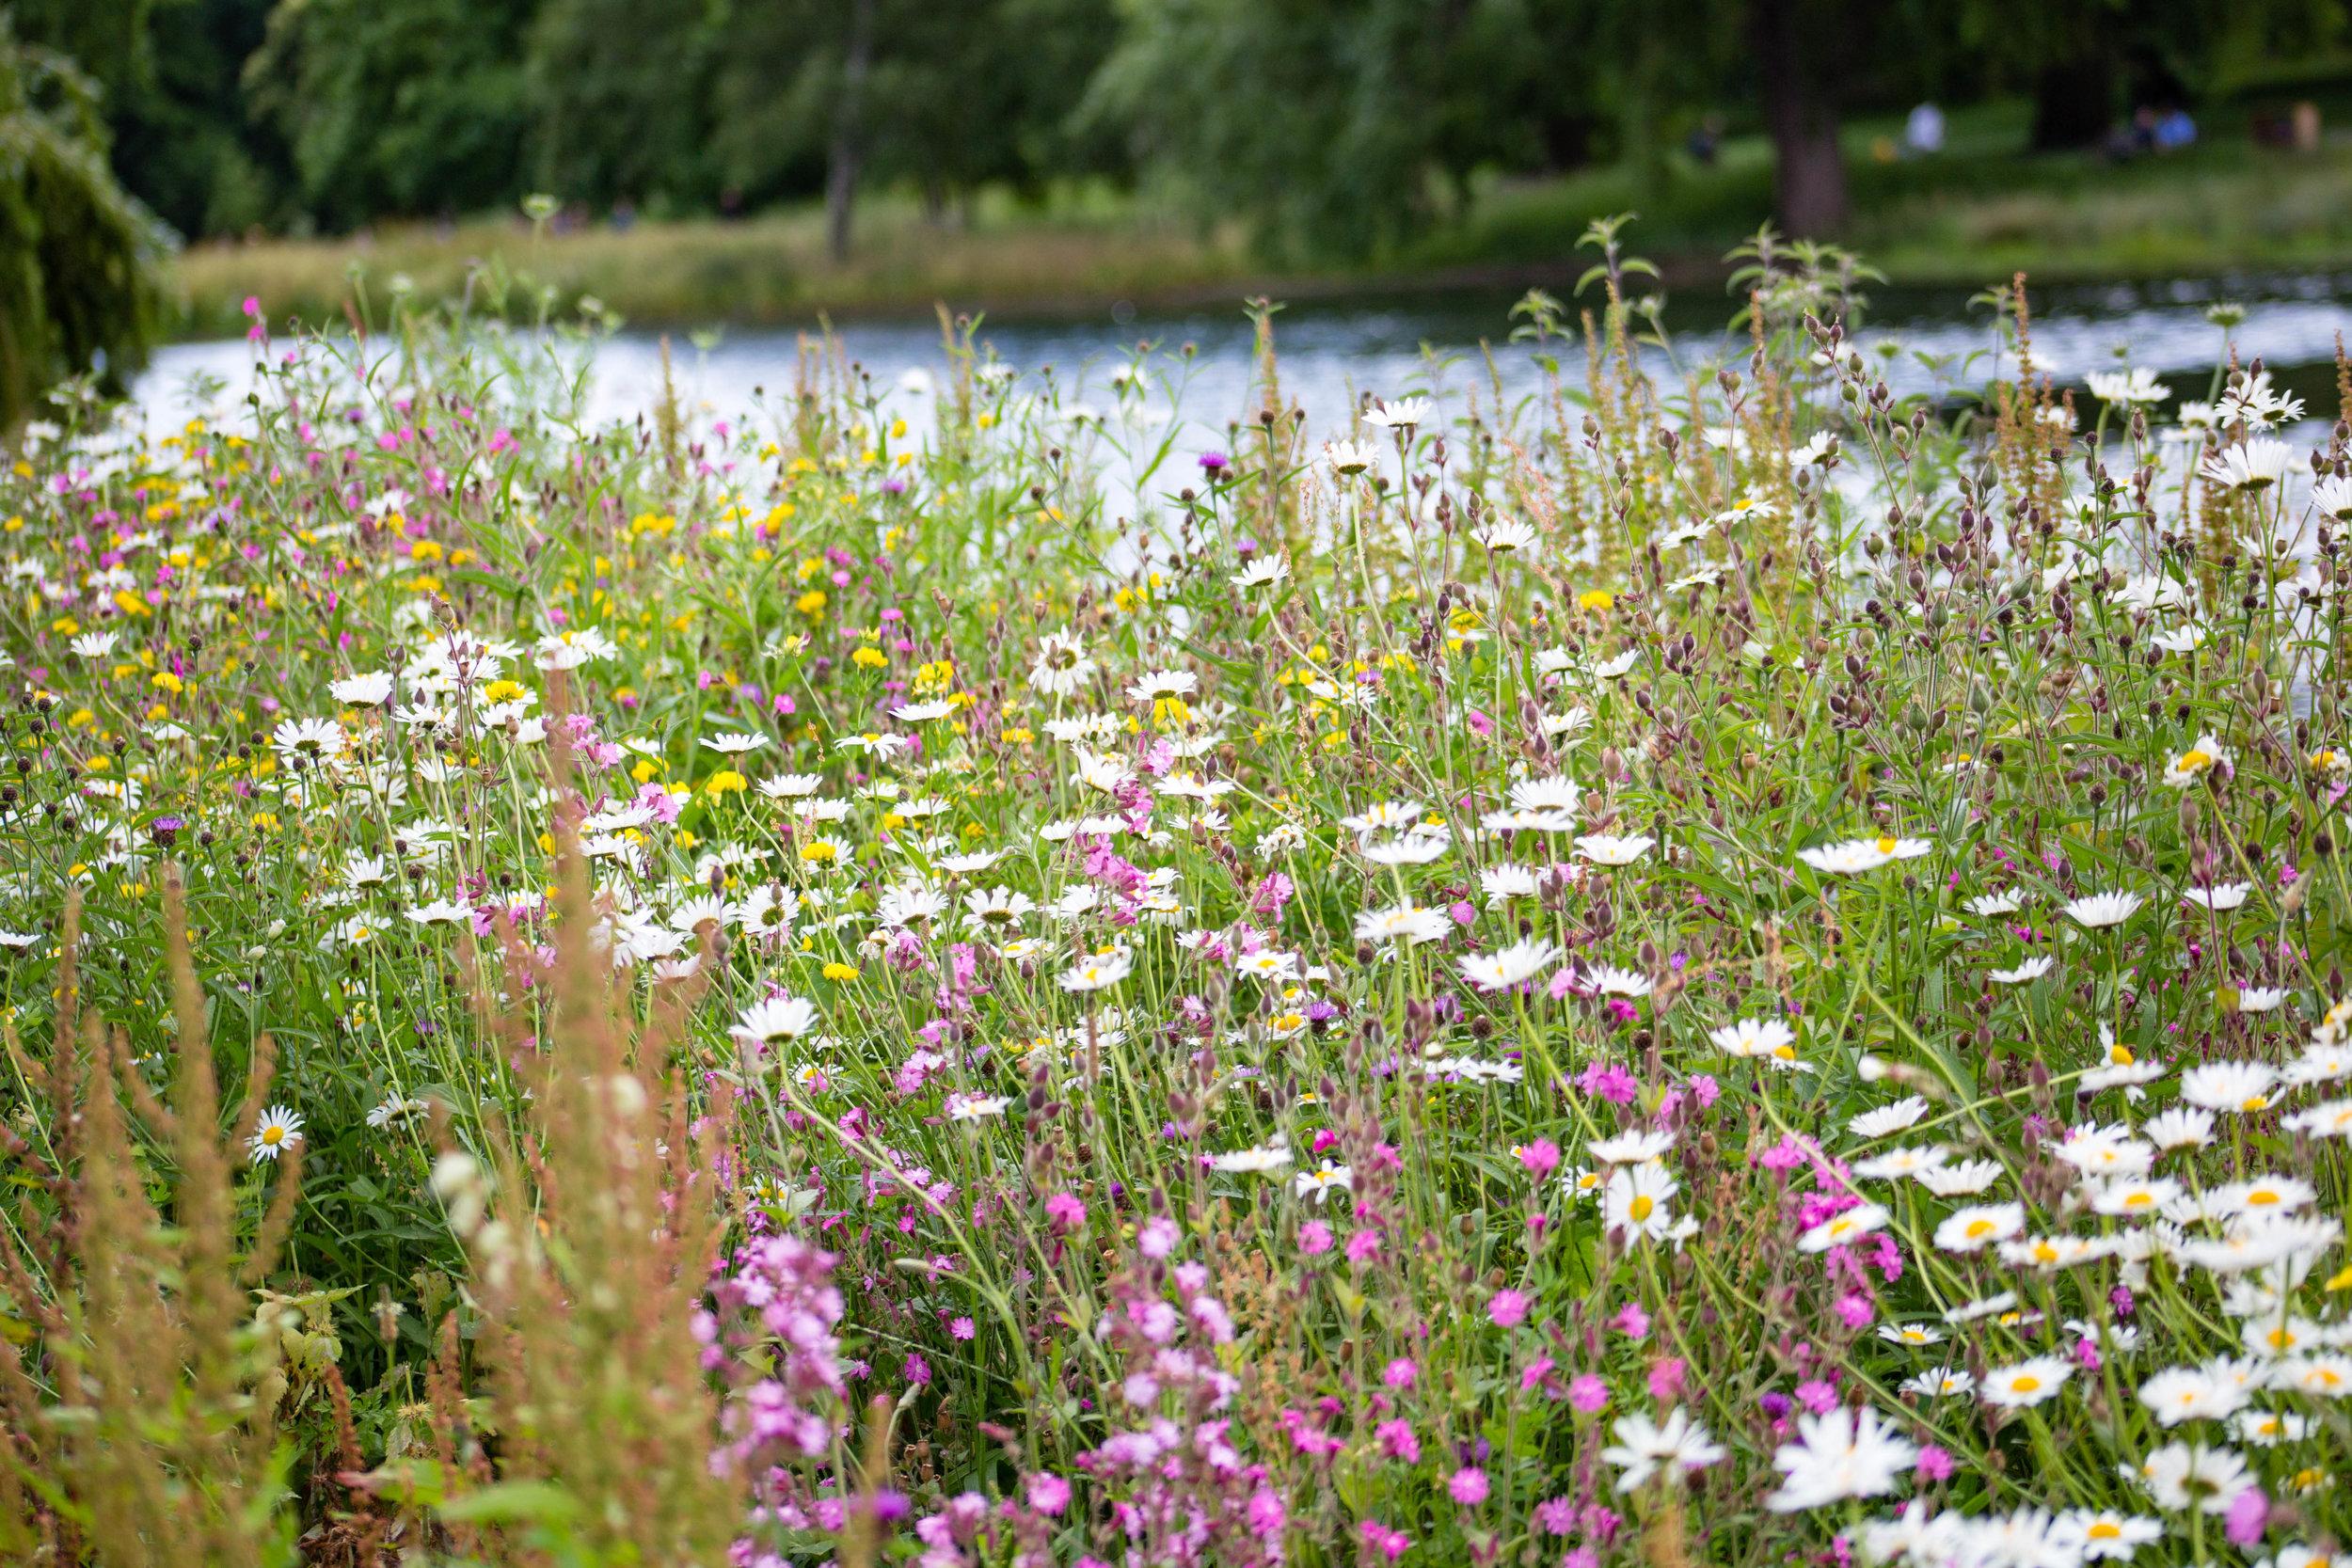 Wild flowers in St James Park